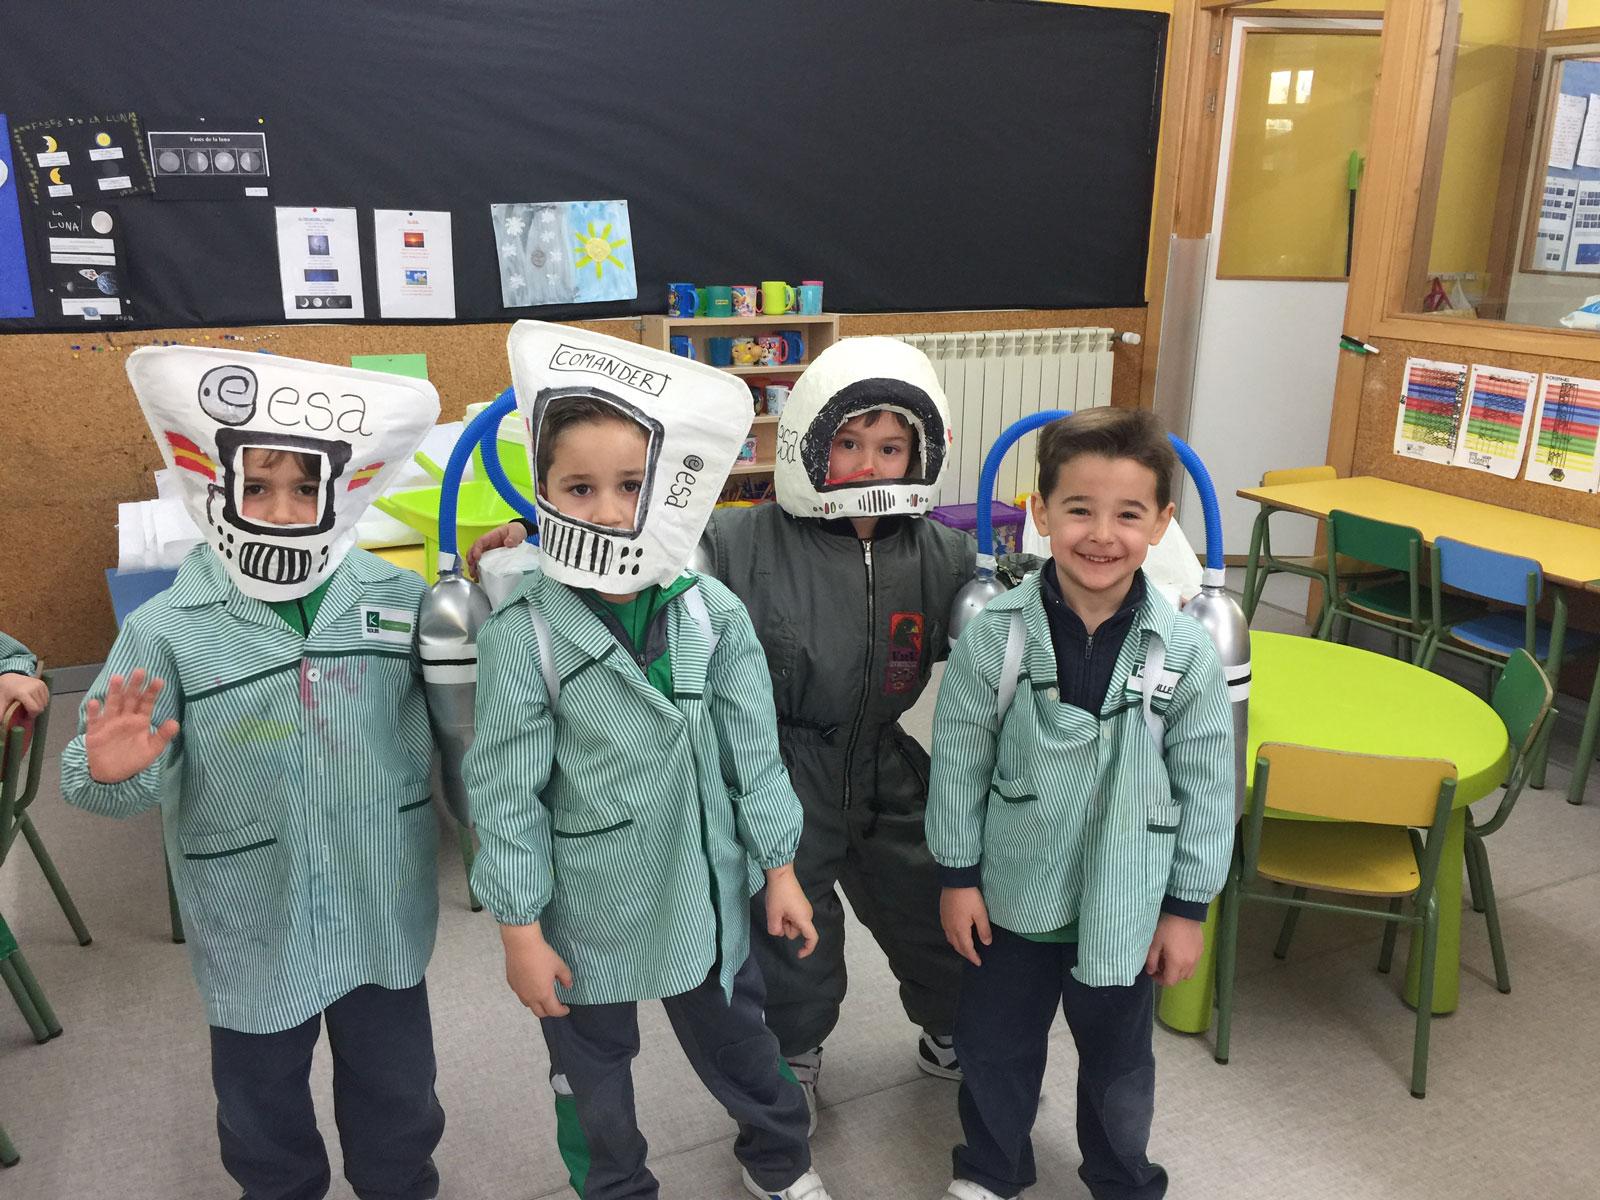 Disfrazados de astronauta